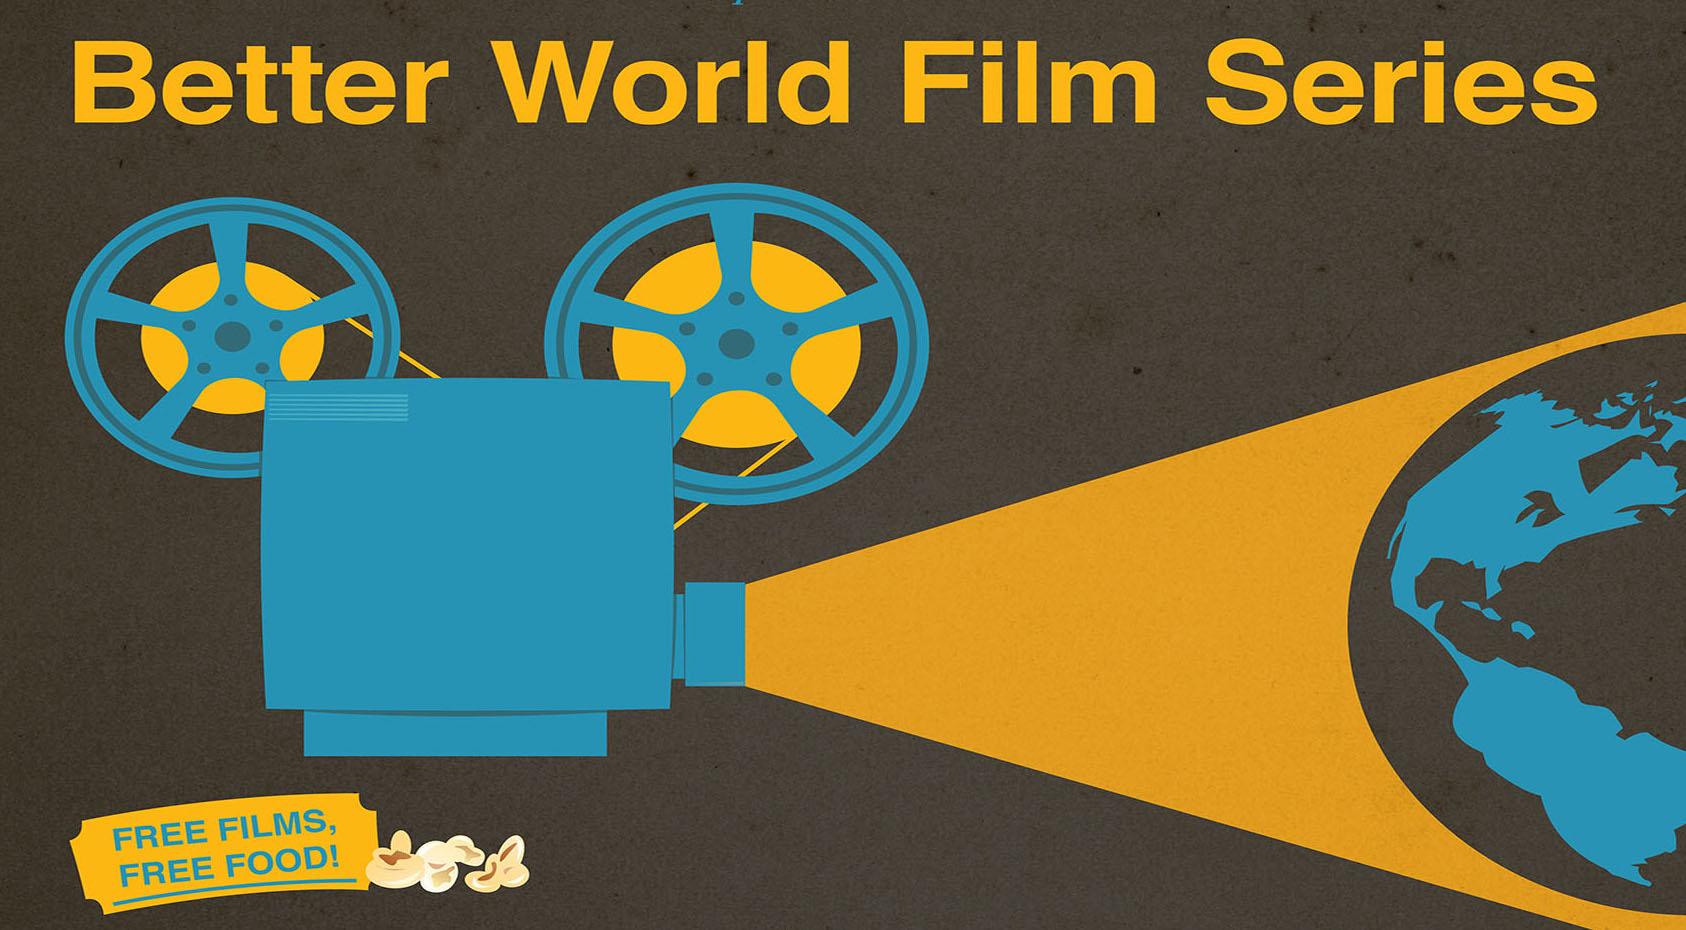 Better World Film Series free films, free food!